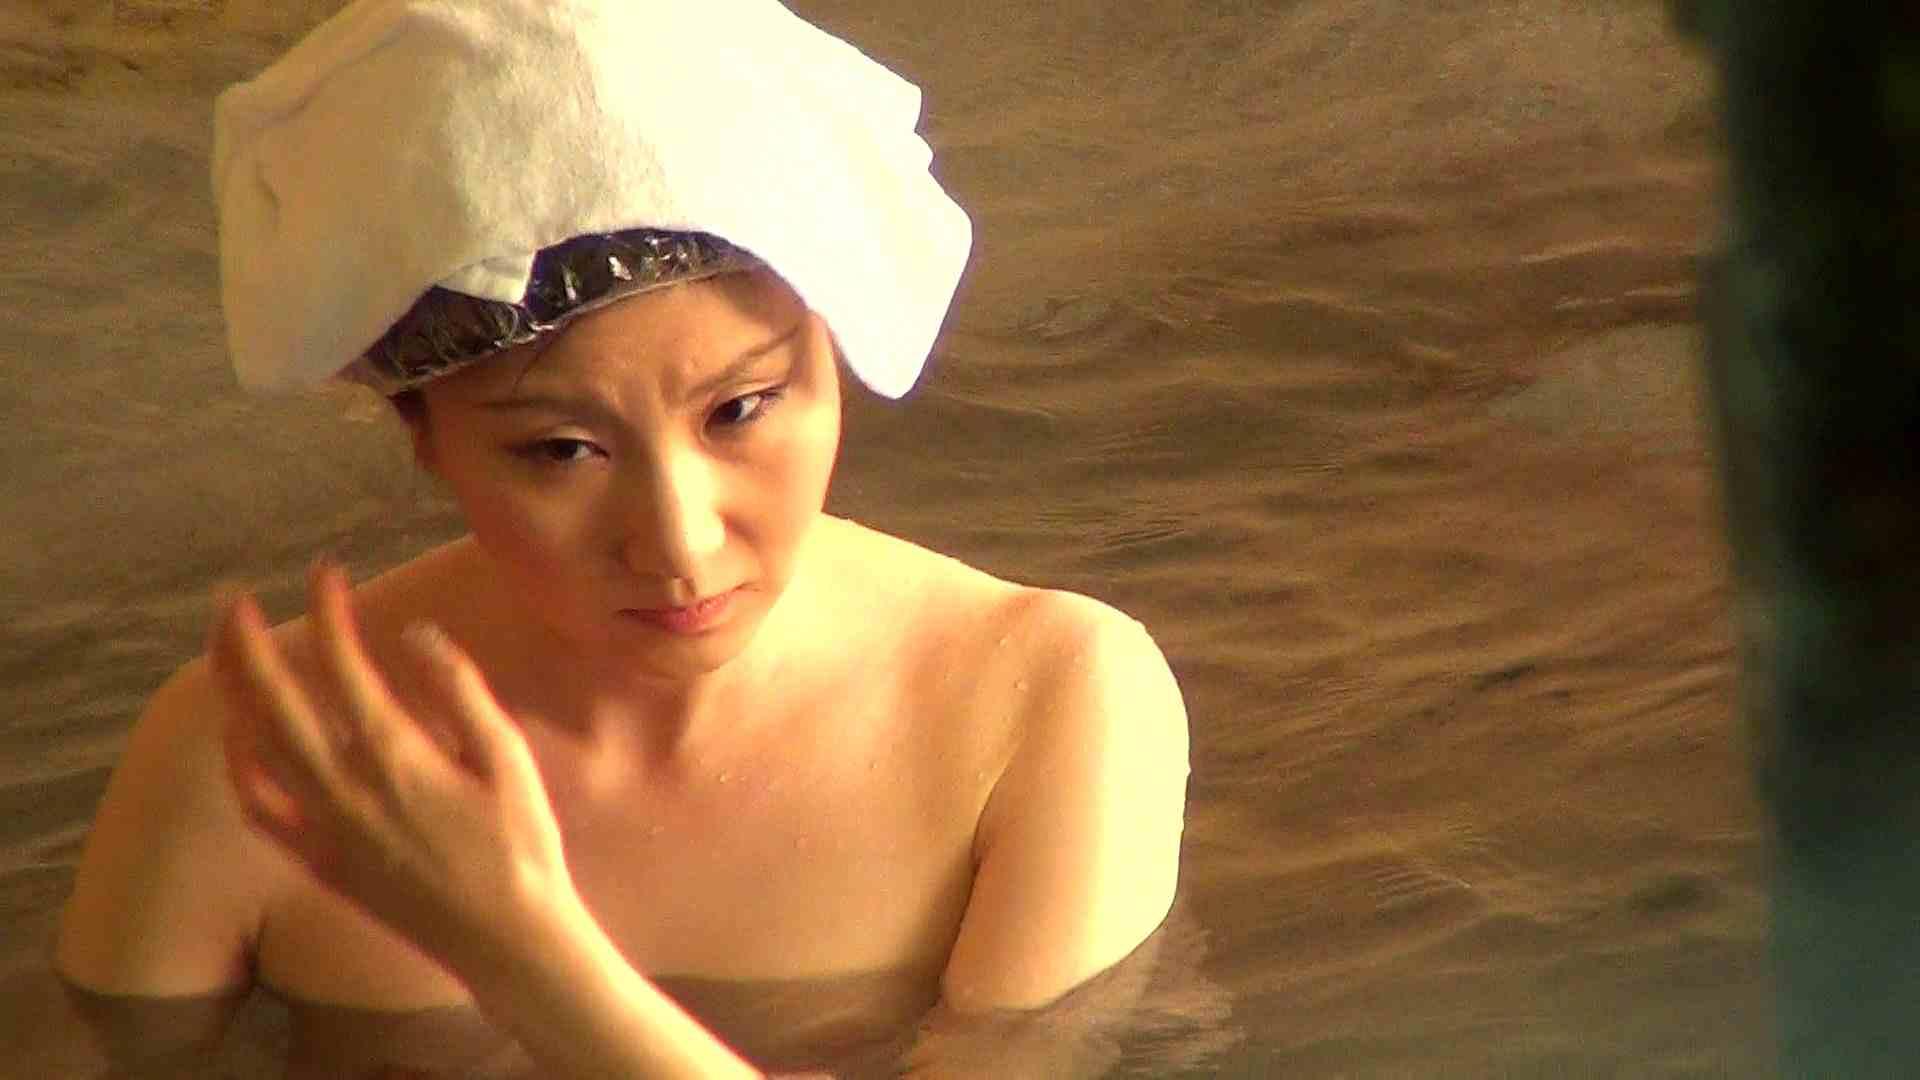 Aquaな露天風呂Vol.278 盗撮シリーズ | 露天風呂編  100PIX 43